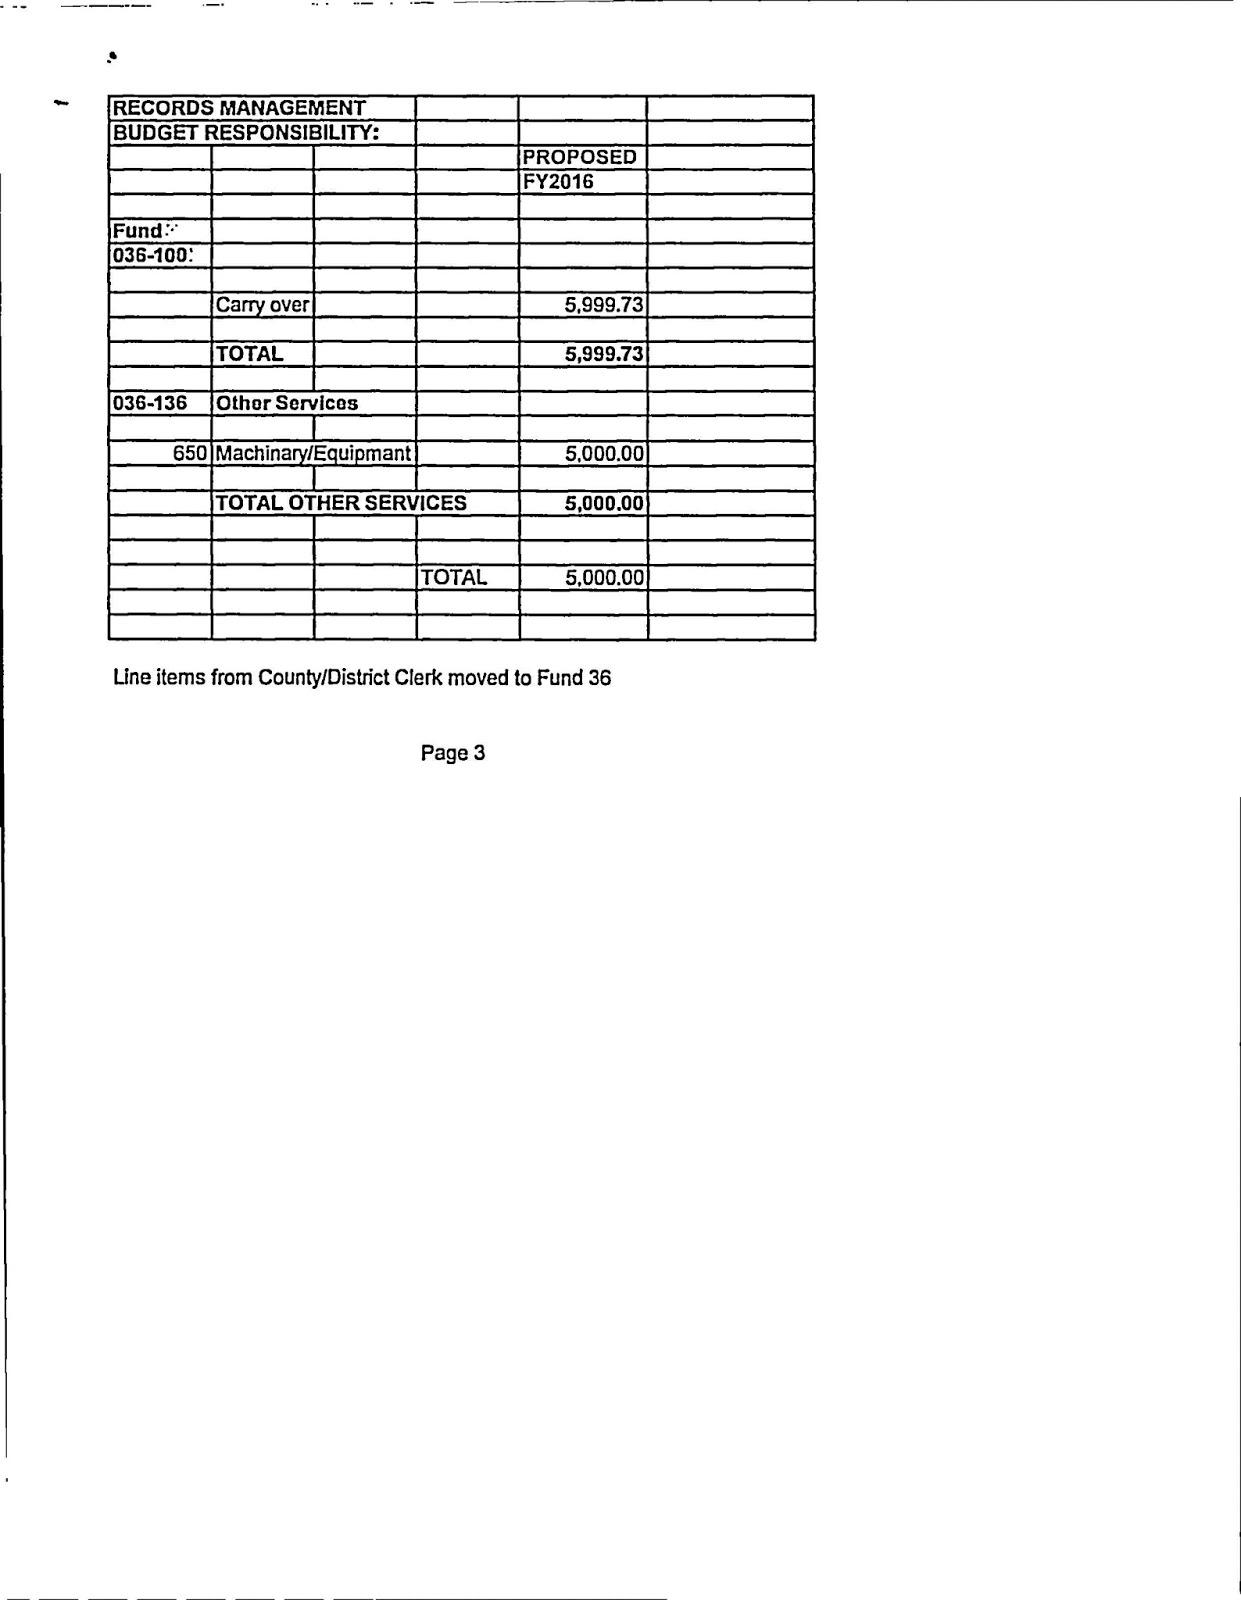 David Beebes online journal Presidio County Final FY